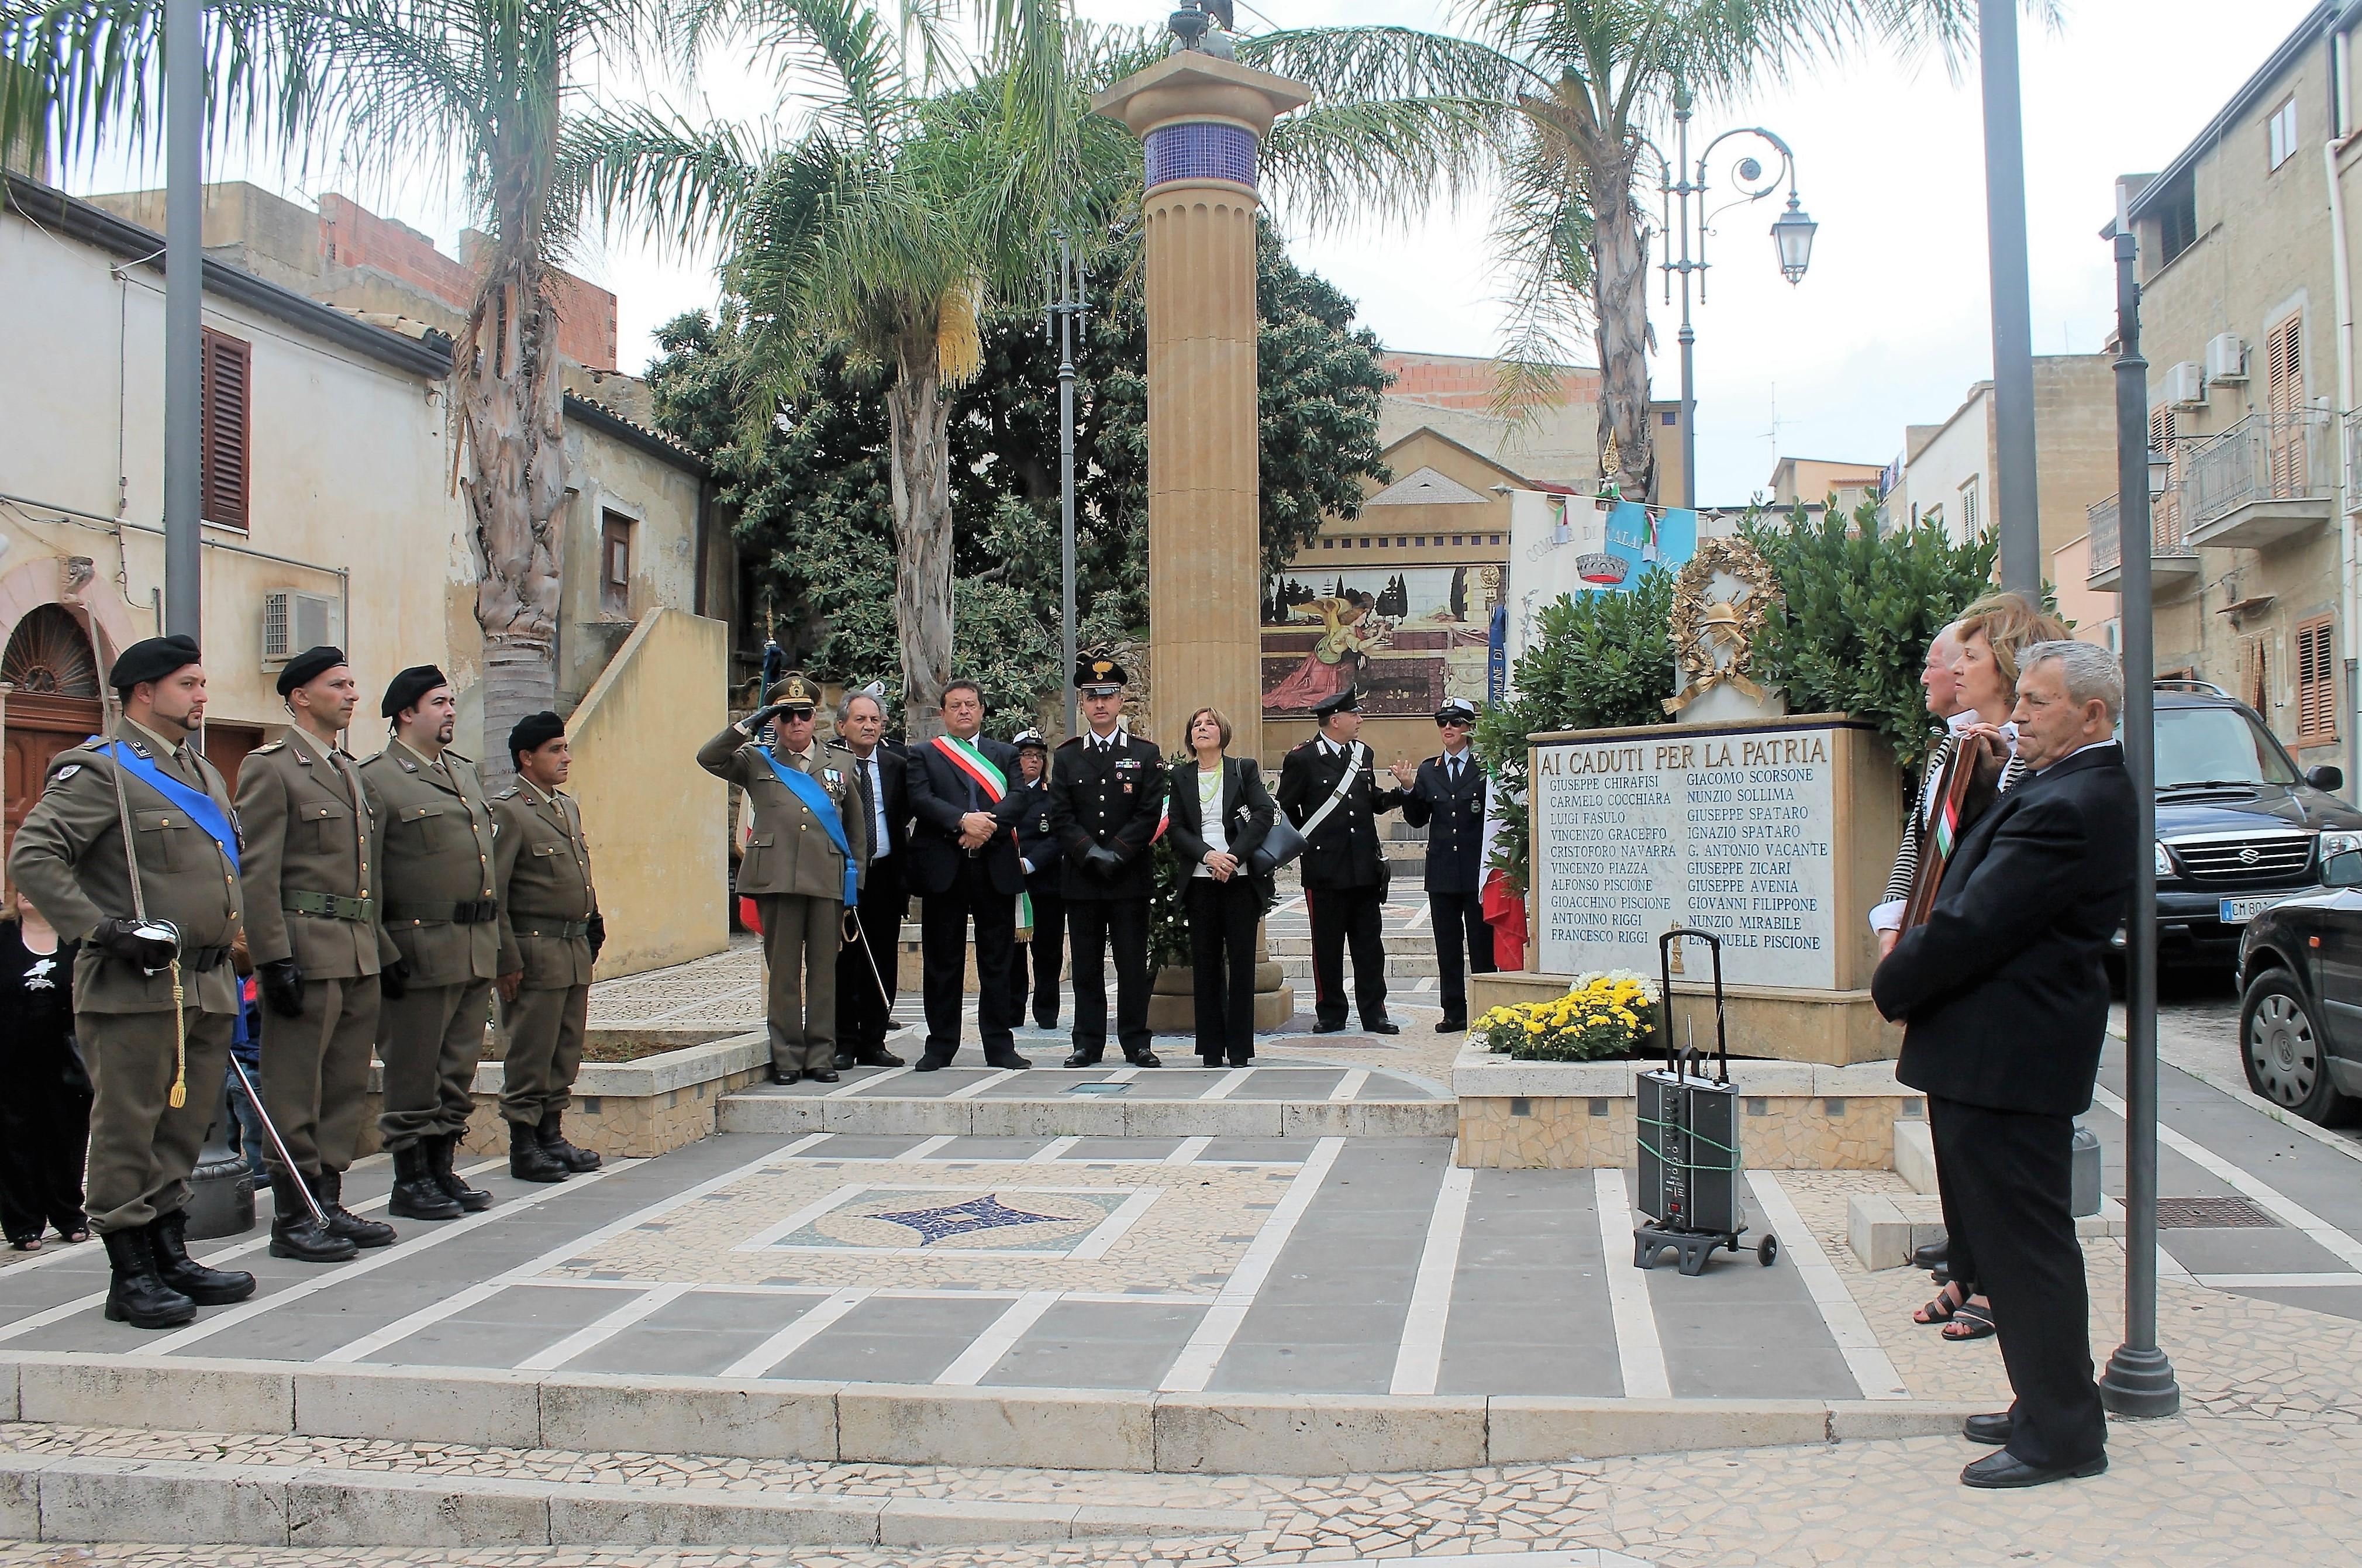 Calamonaci Festa Forze Armate 6.11.2016